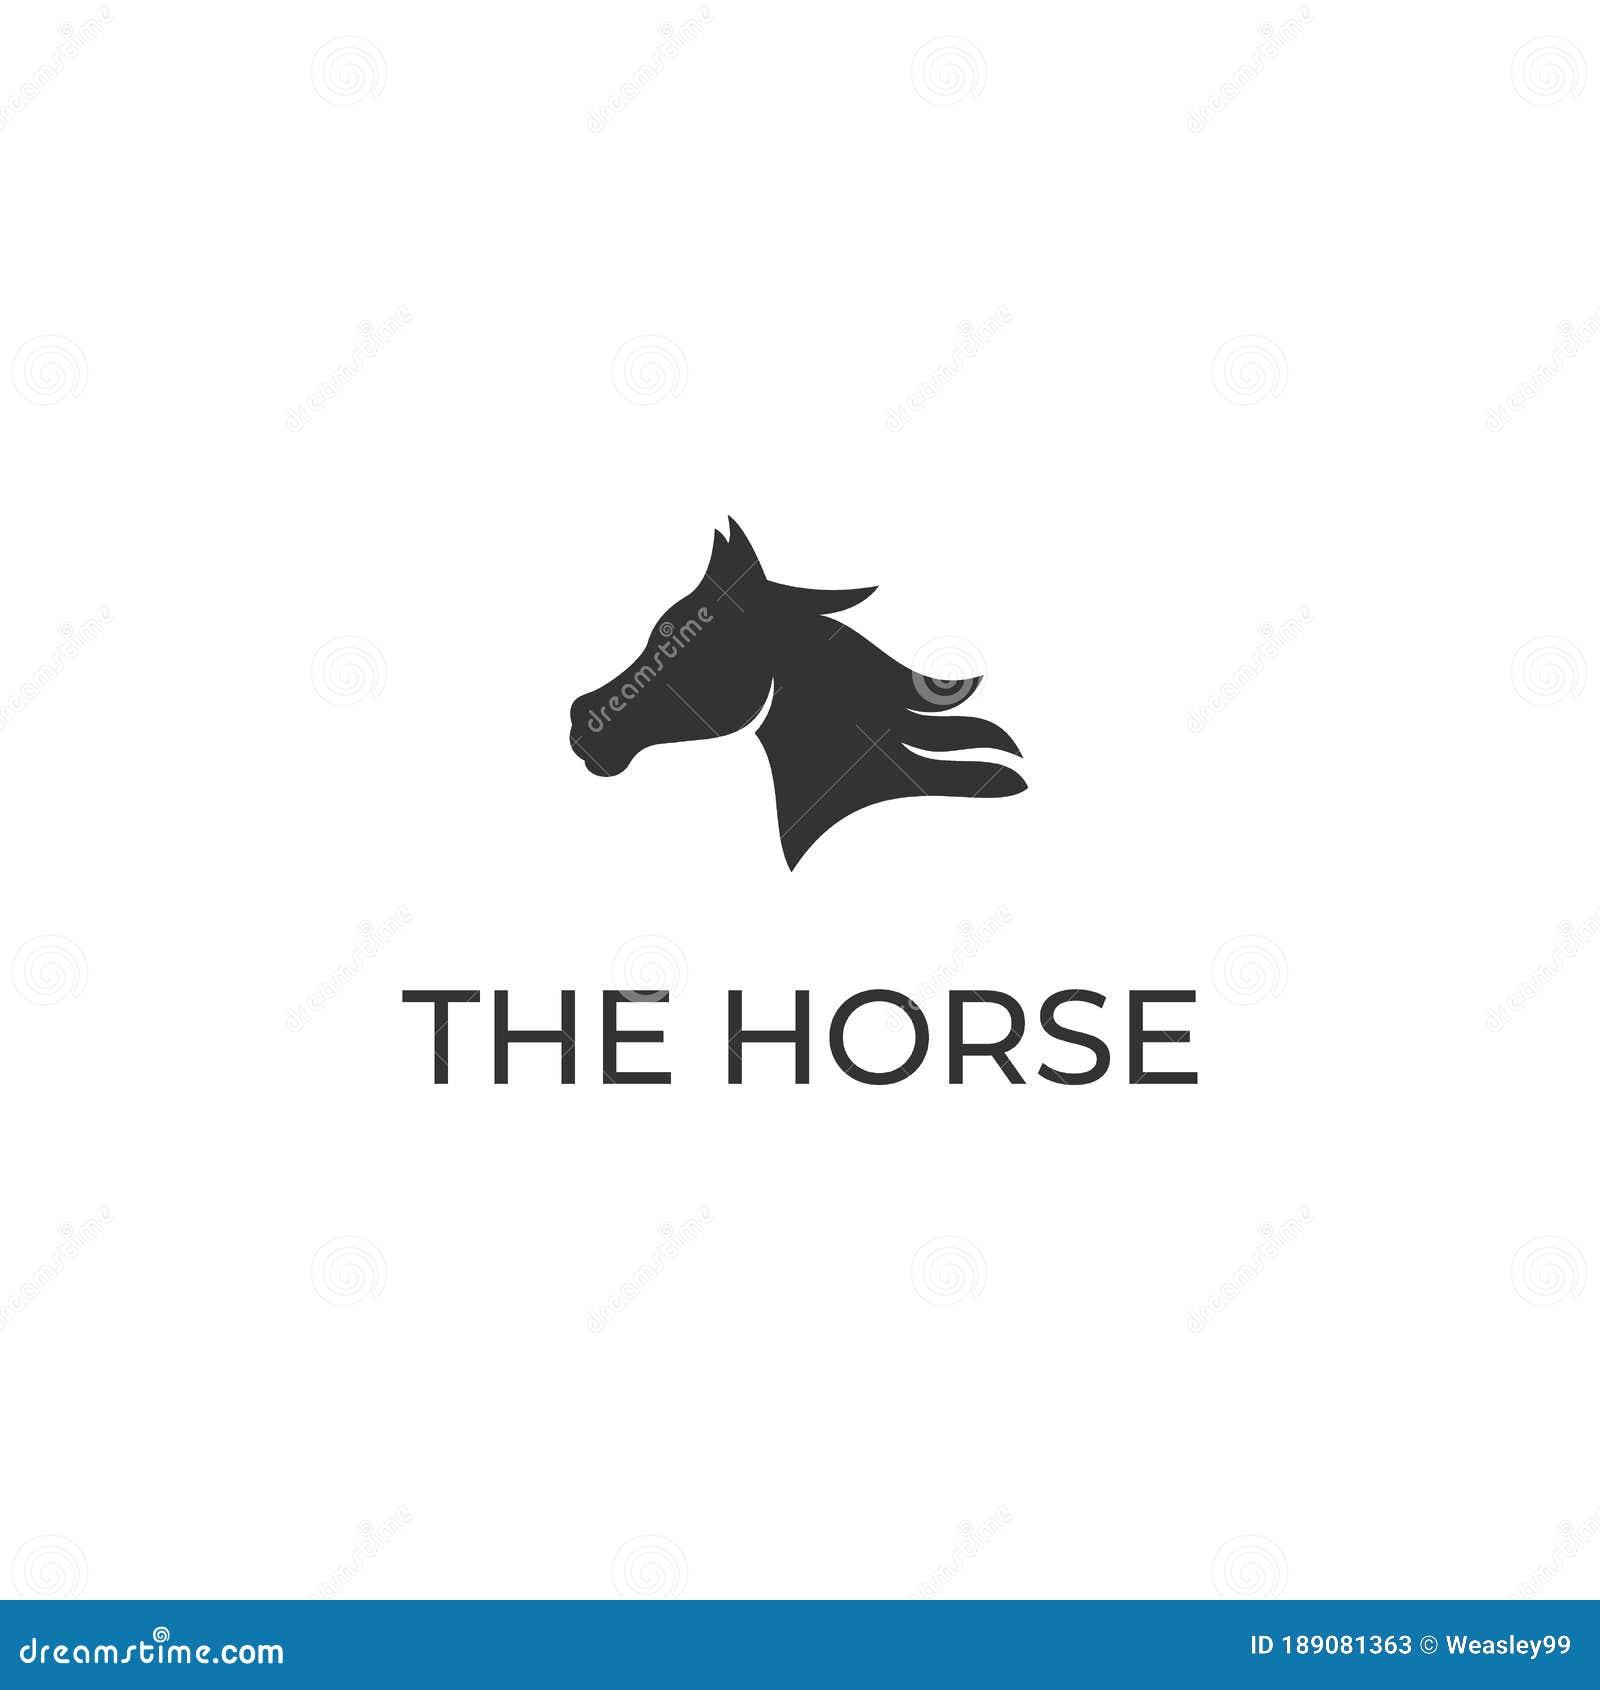 Simple Horse Head Logo Design Stock Vector Illustration Of Horse Horseback 189081363